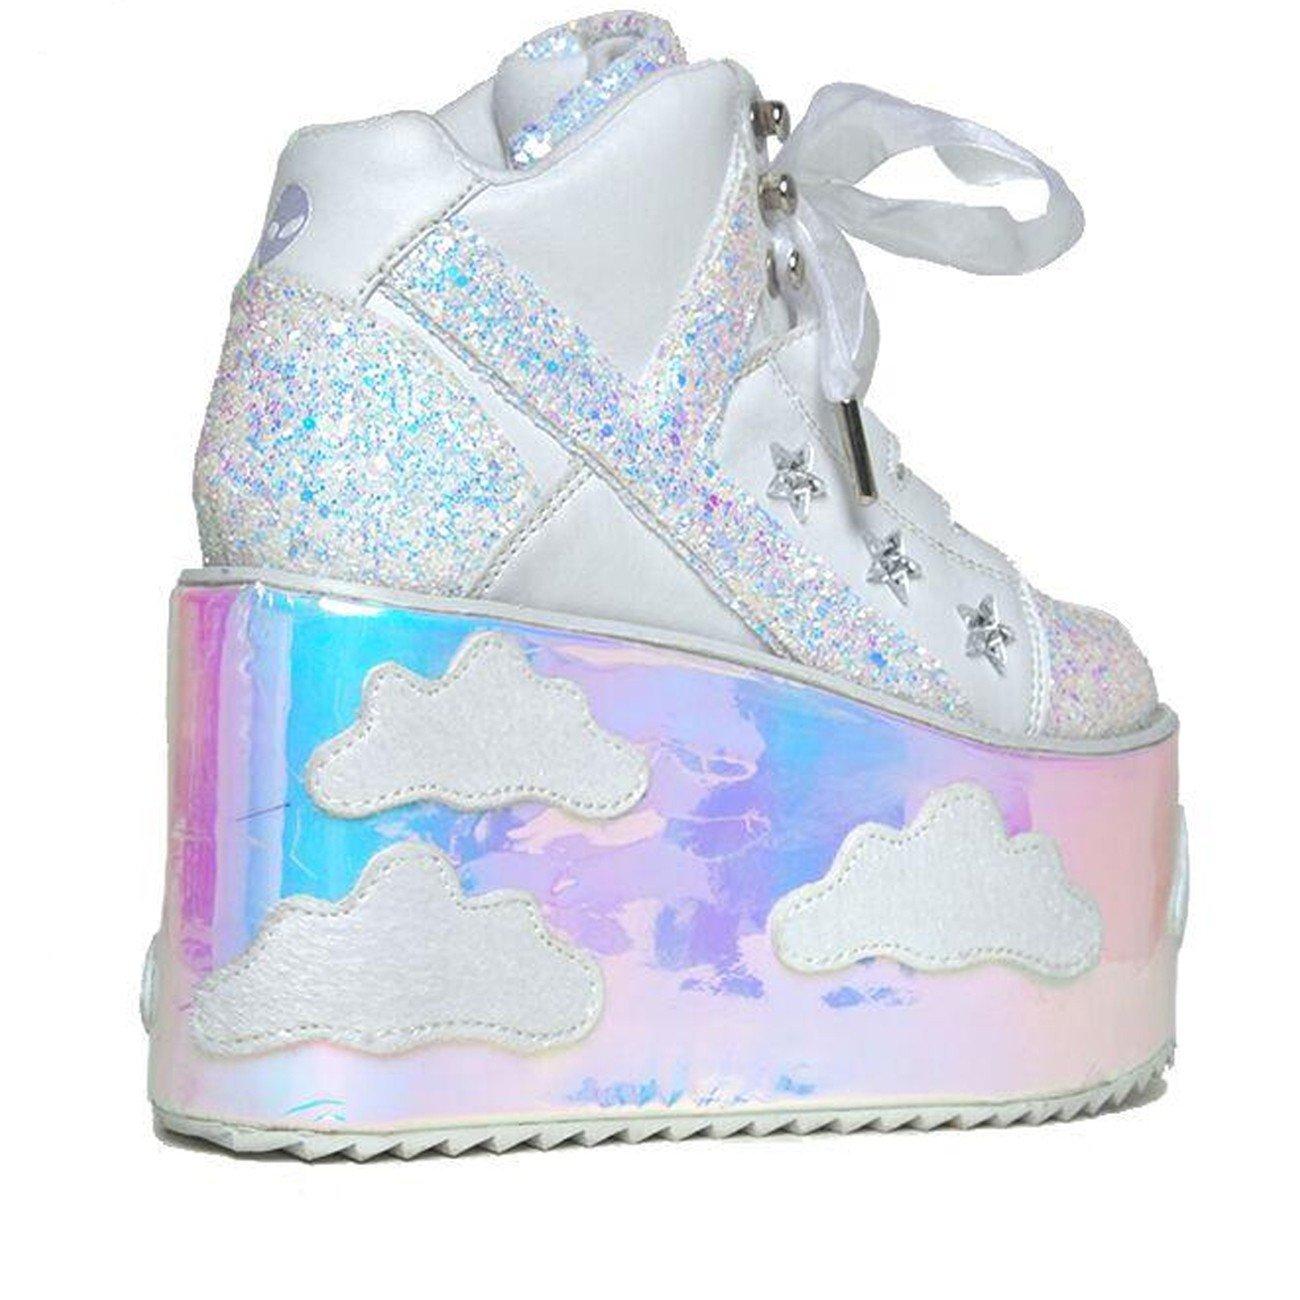 c4c00f1cc9 Amazon.com | YRU 'Qozmo Sky Sky', Hologram, Cloud Scene Platform | Fashion  Sneakers